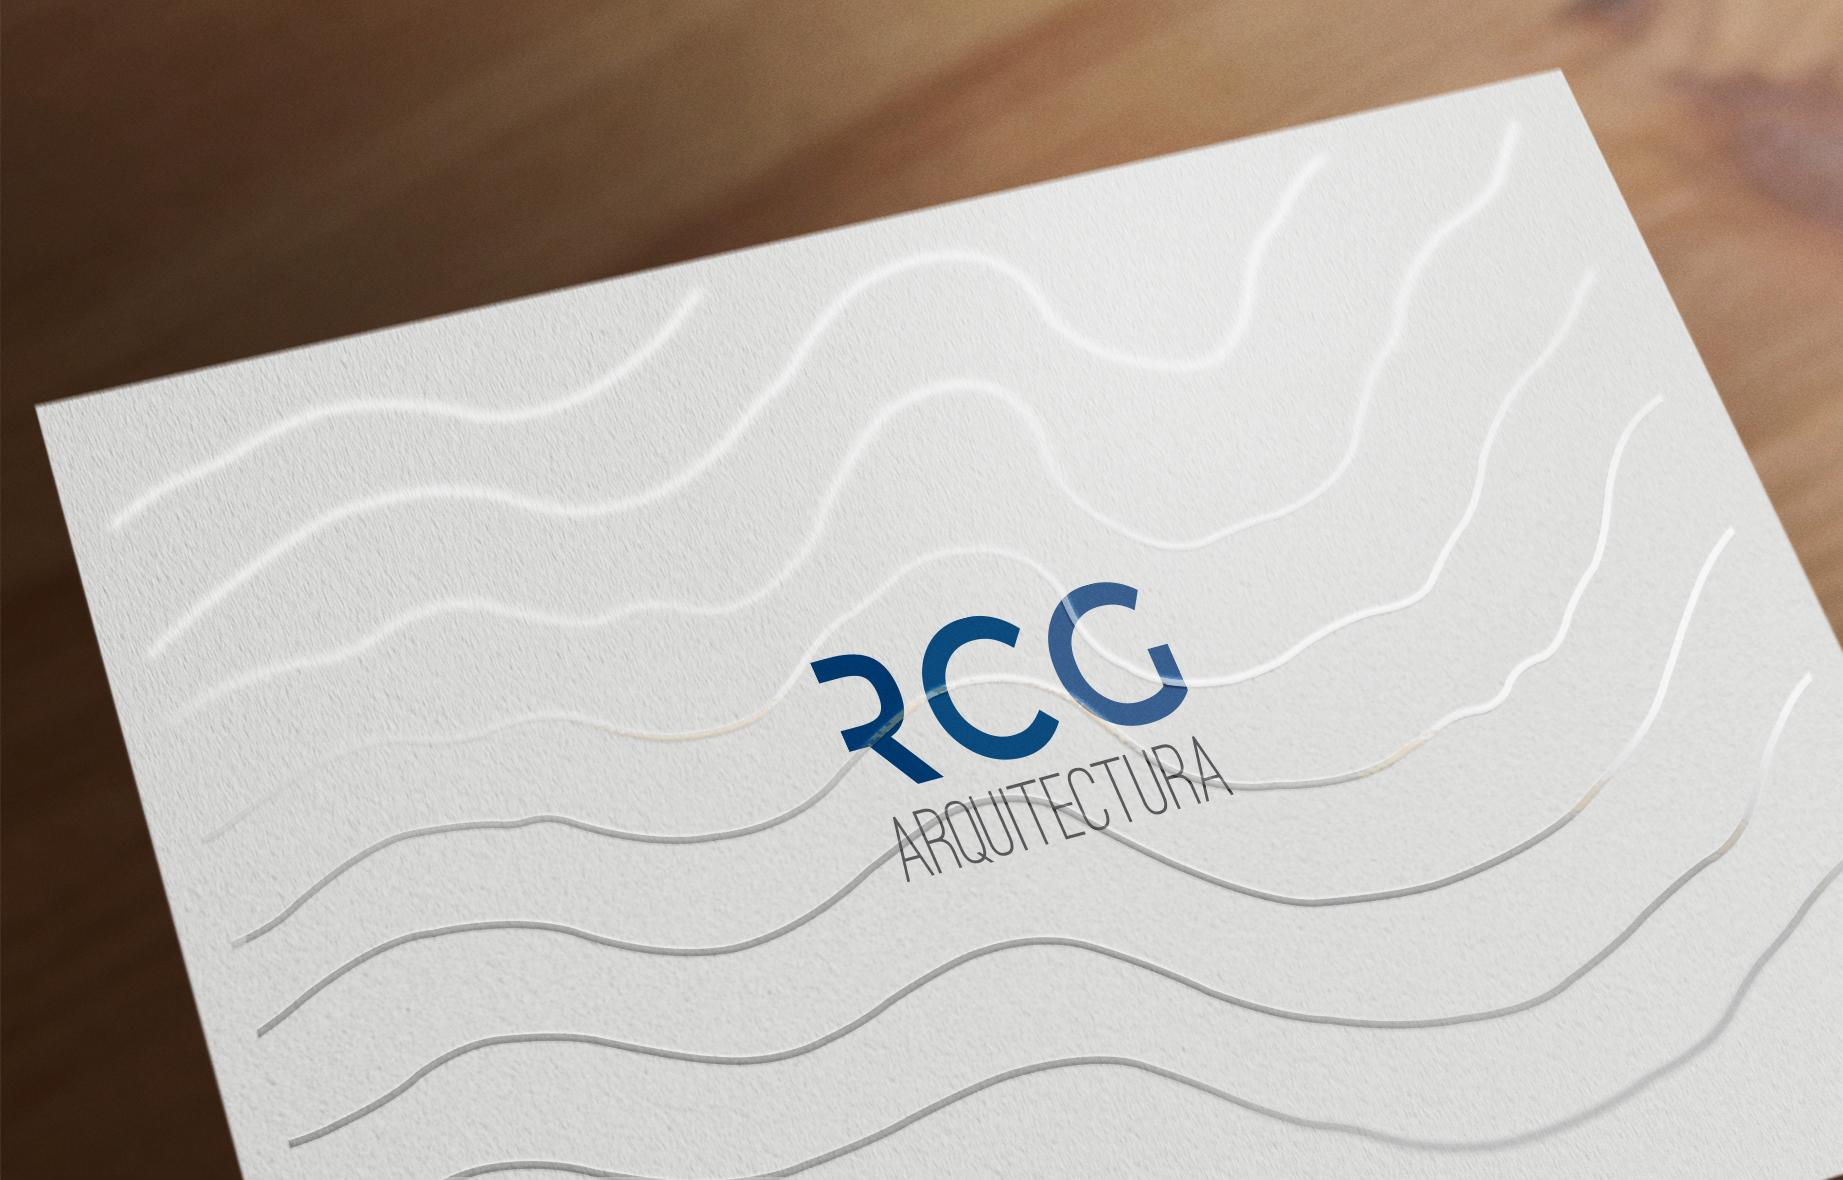 RCG_UVI.jpg